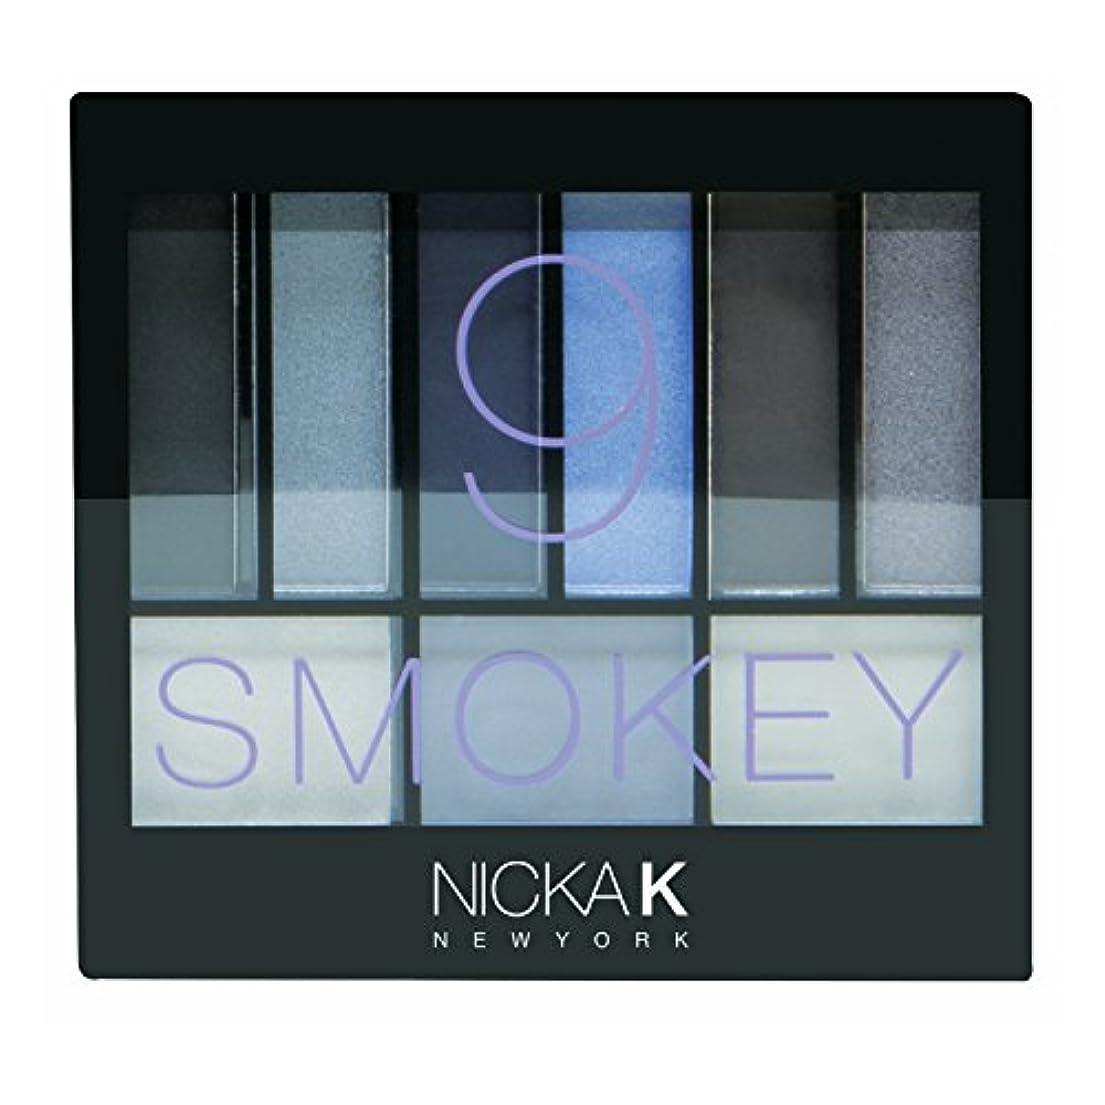 程度見出し出血NICKA K Perfect 9 Smokey Eyeshadow Palette Set (並行輸入品)